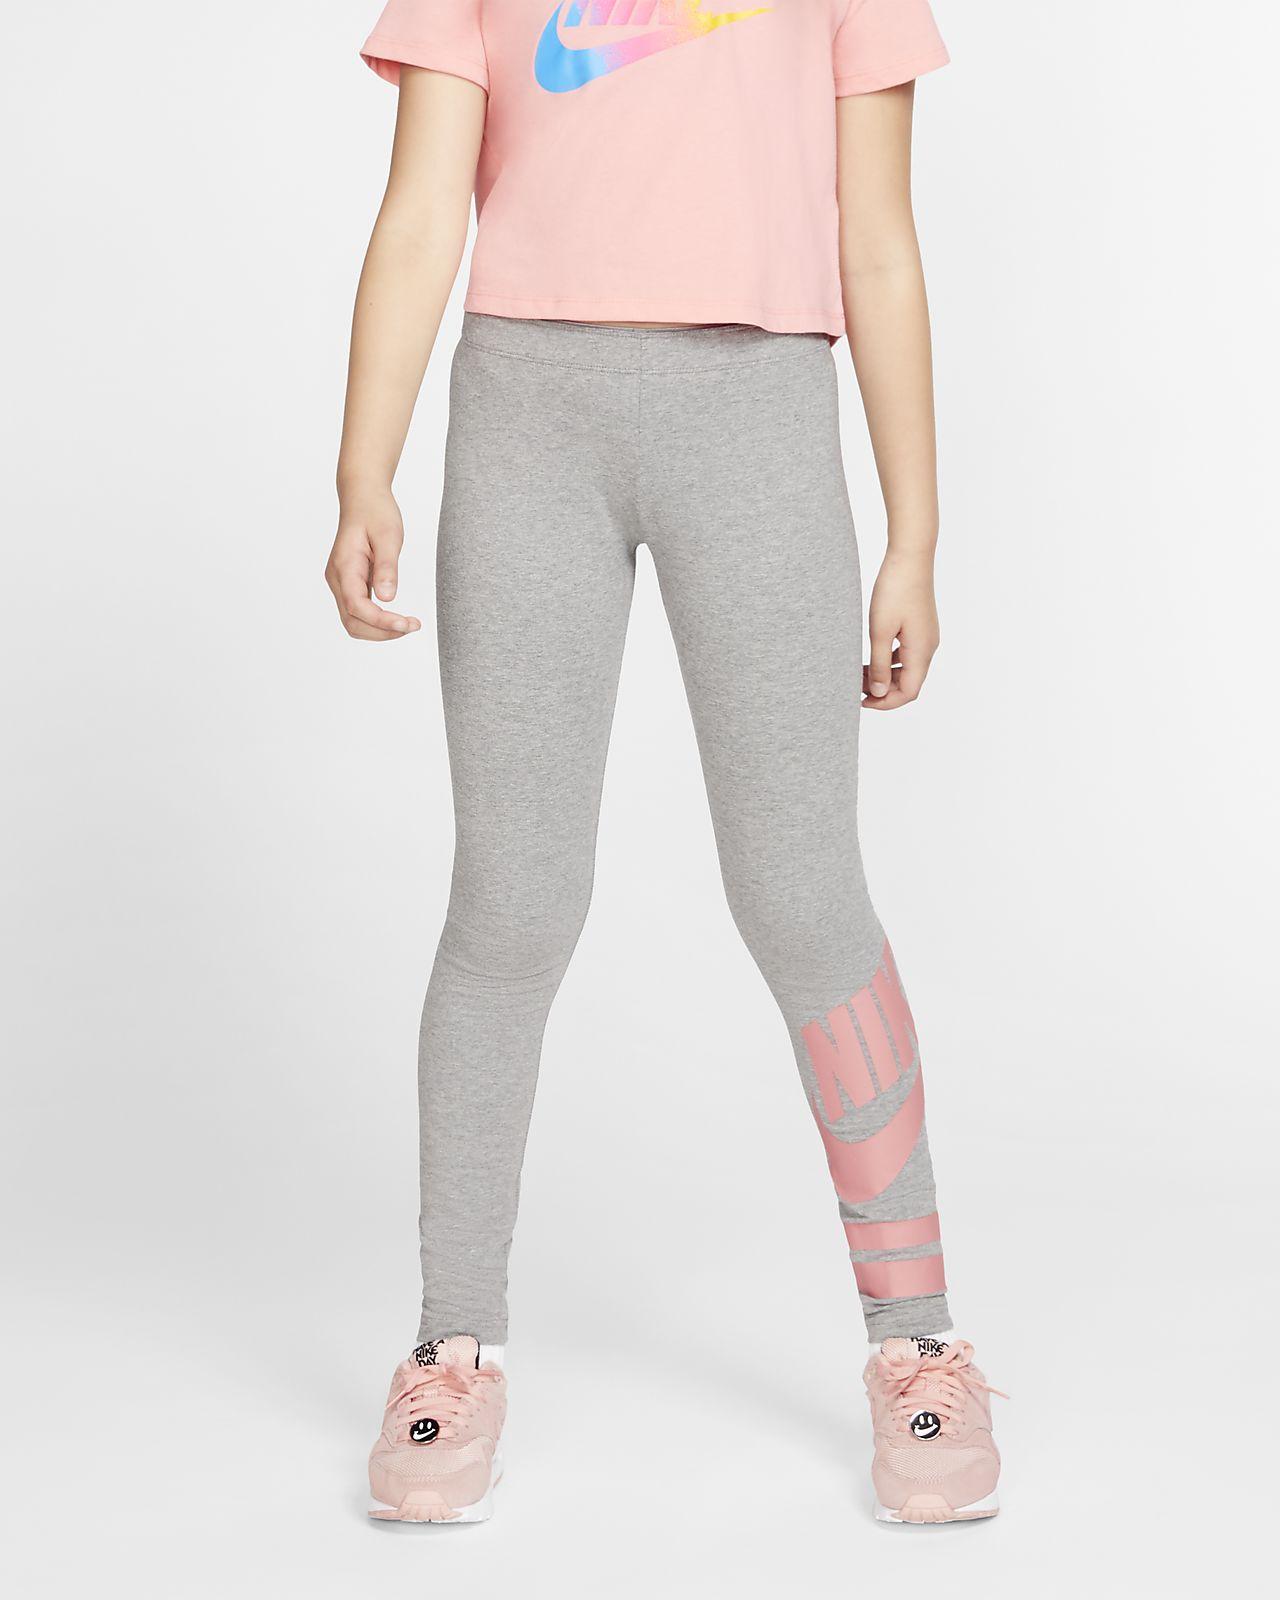 b1c38ab99c8 Κολάν με σχέδια Nike Sportswear για μεγάλα κορίτσια